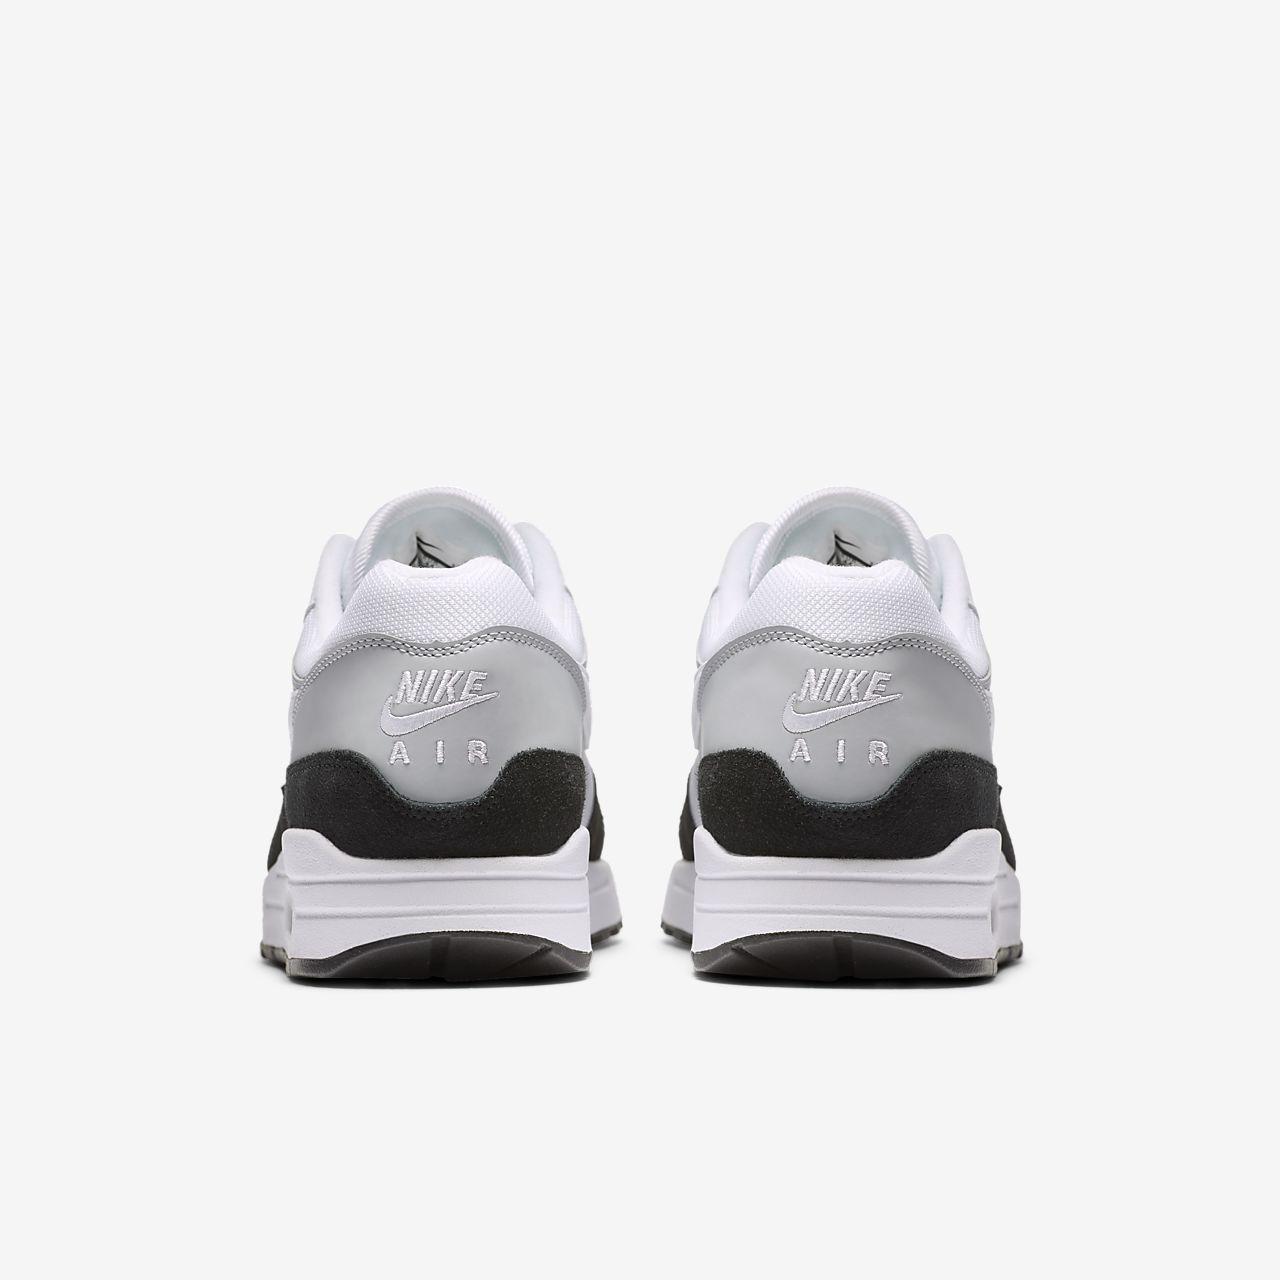 premium selection b615e 780f6 Chaussure Nike Air Max 1 pour Homme ...